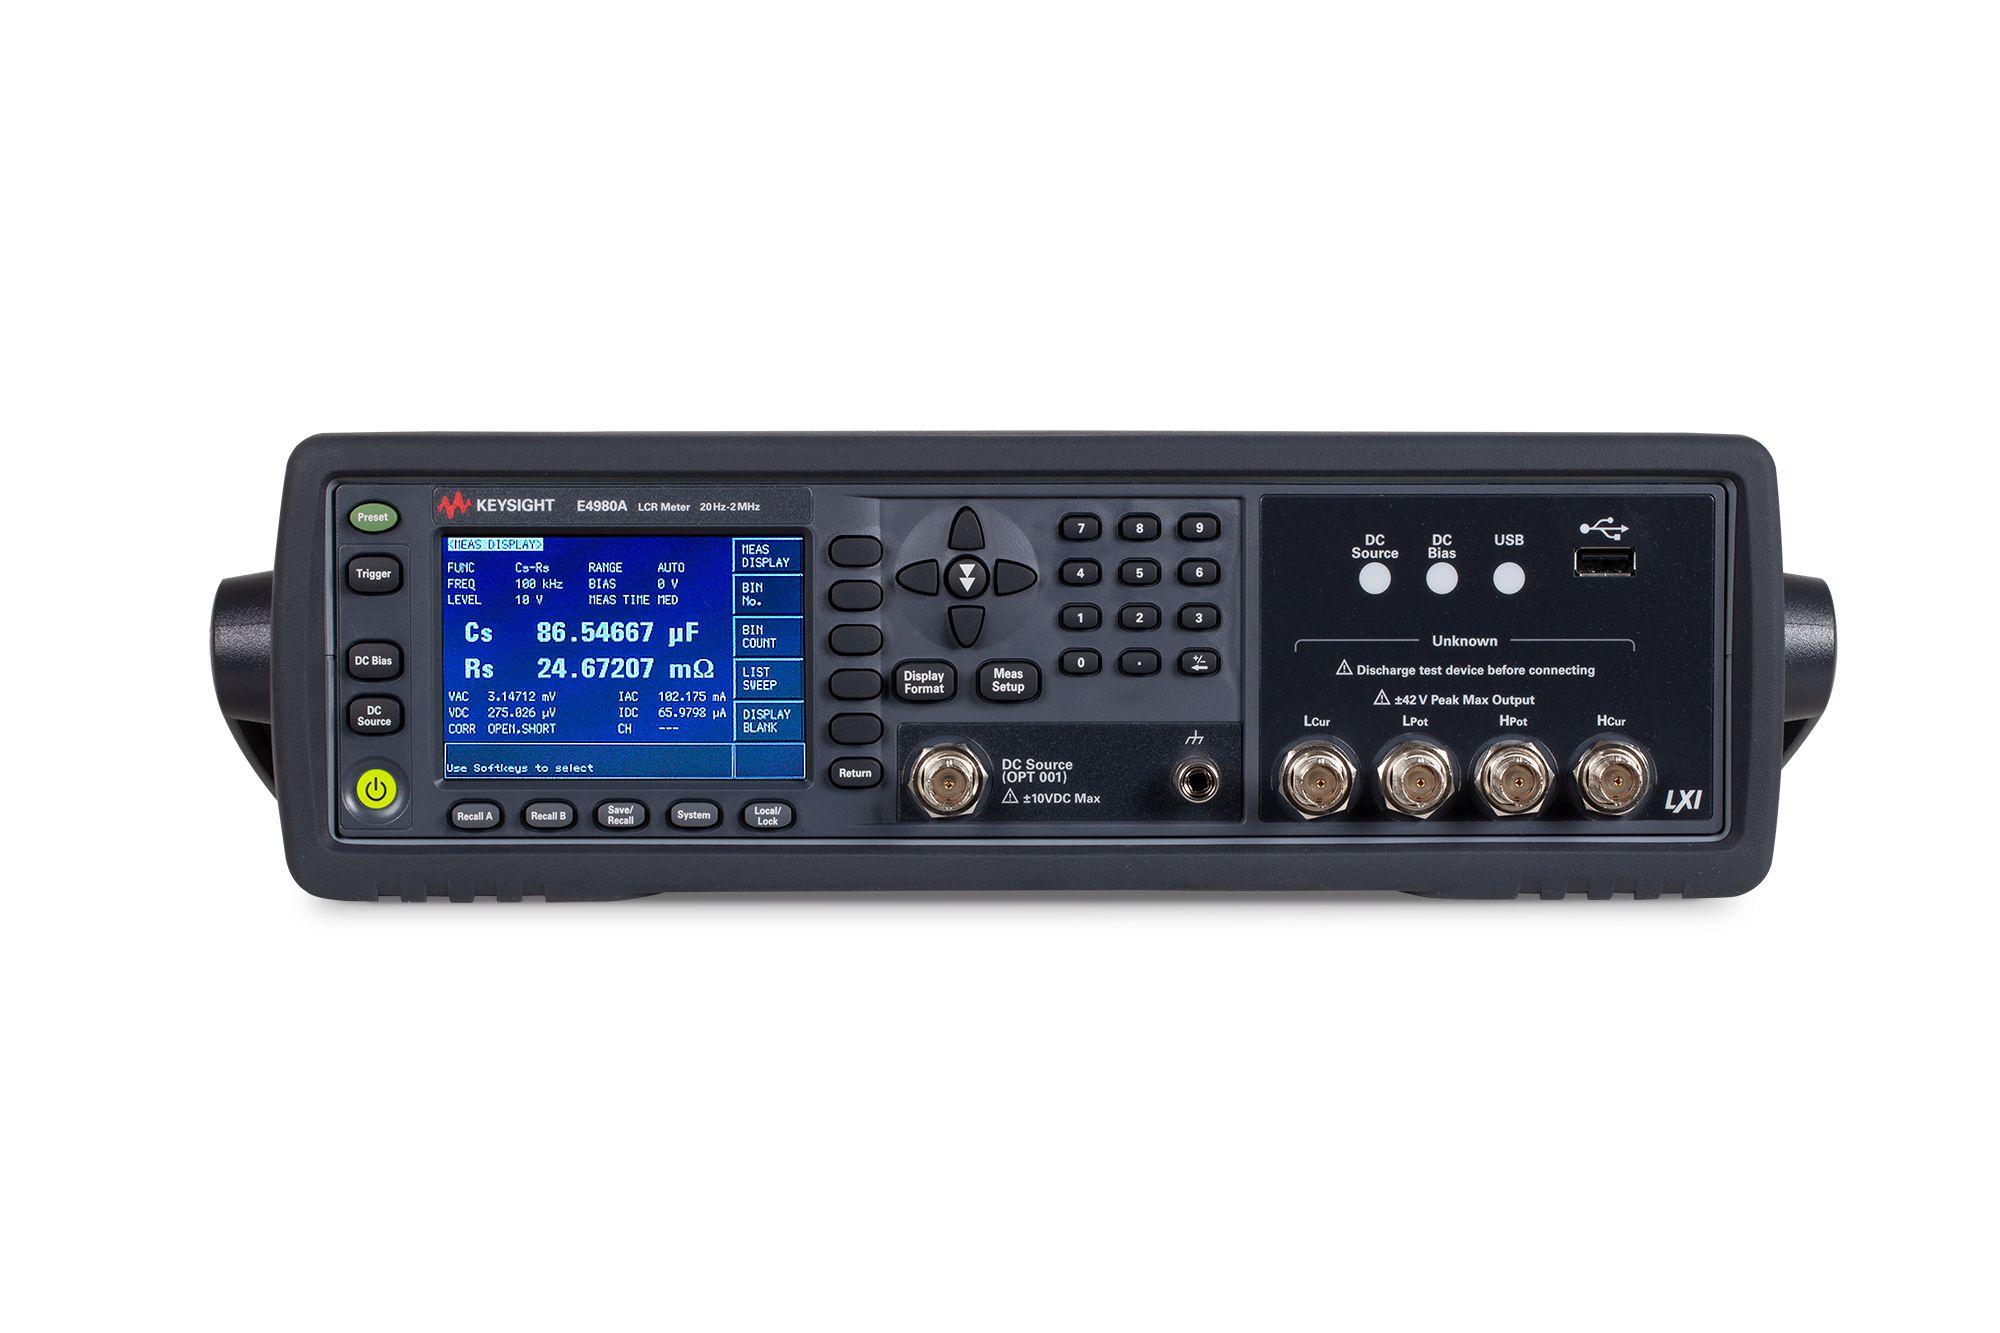 Keysight E4980A w/001 Precision LCR Meter